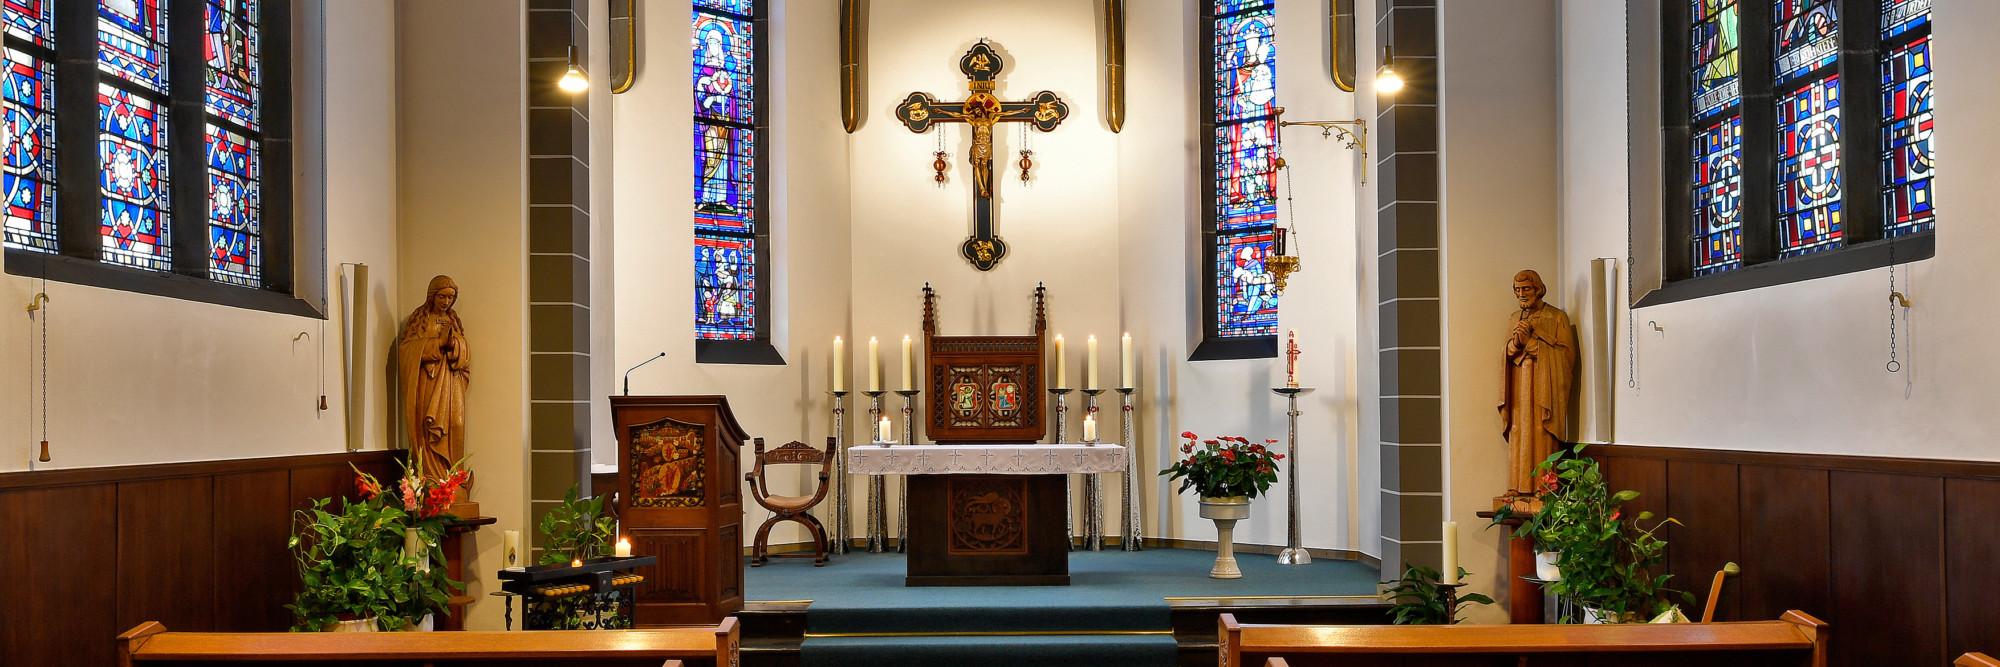 Blick auf den Altar der Kapelle im Marienhospital Kevelaer.